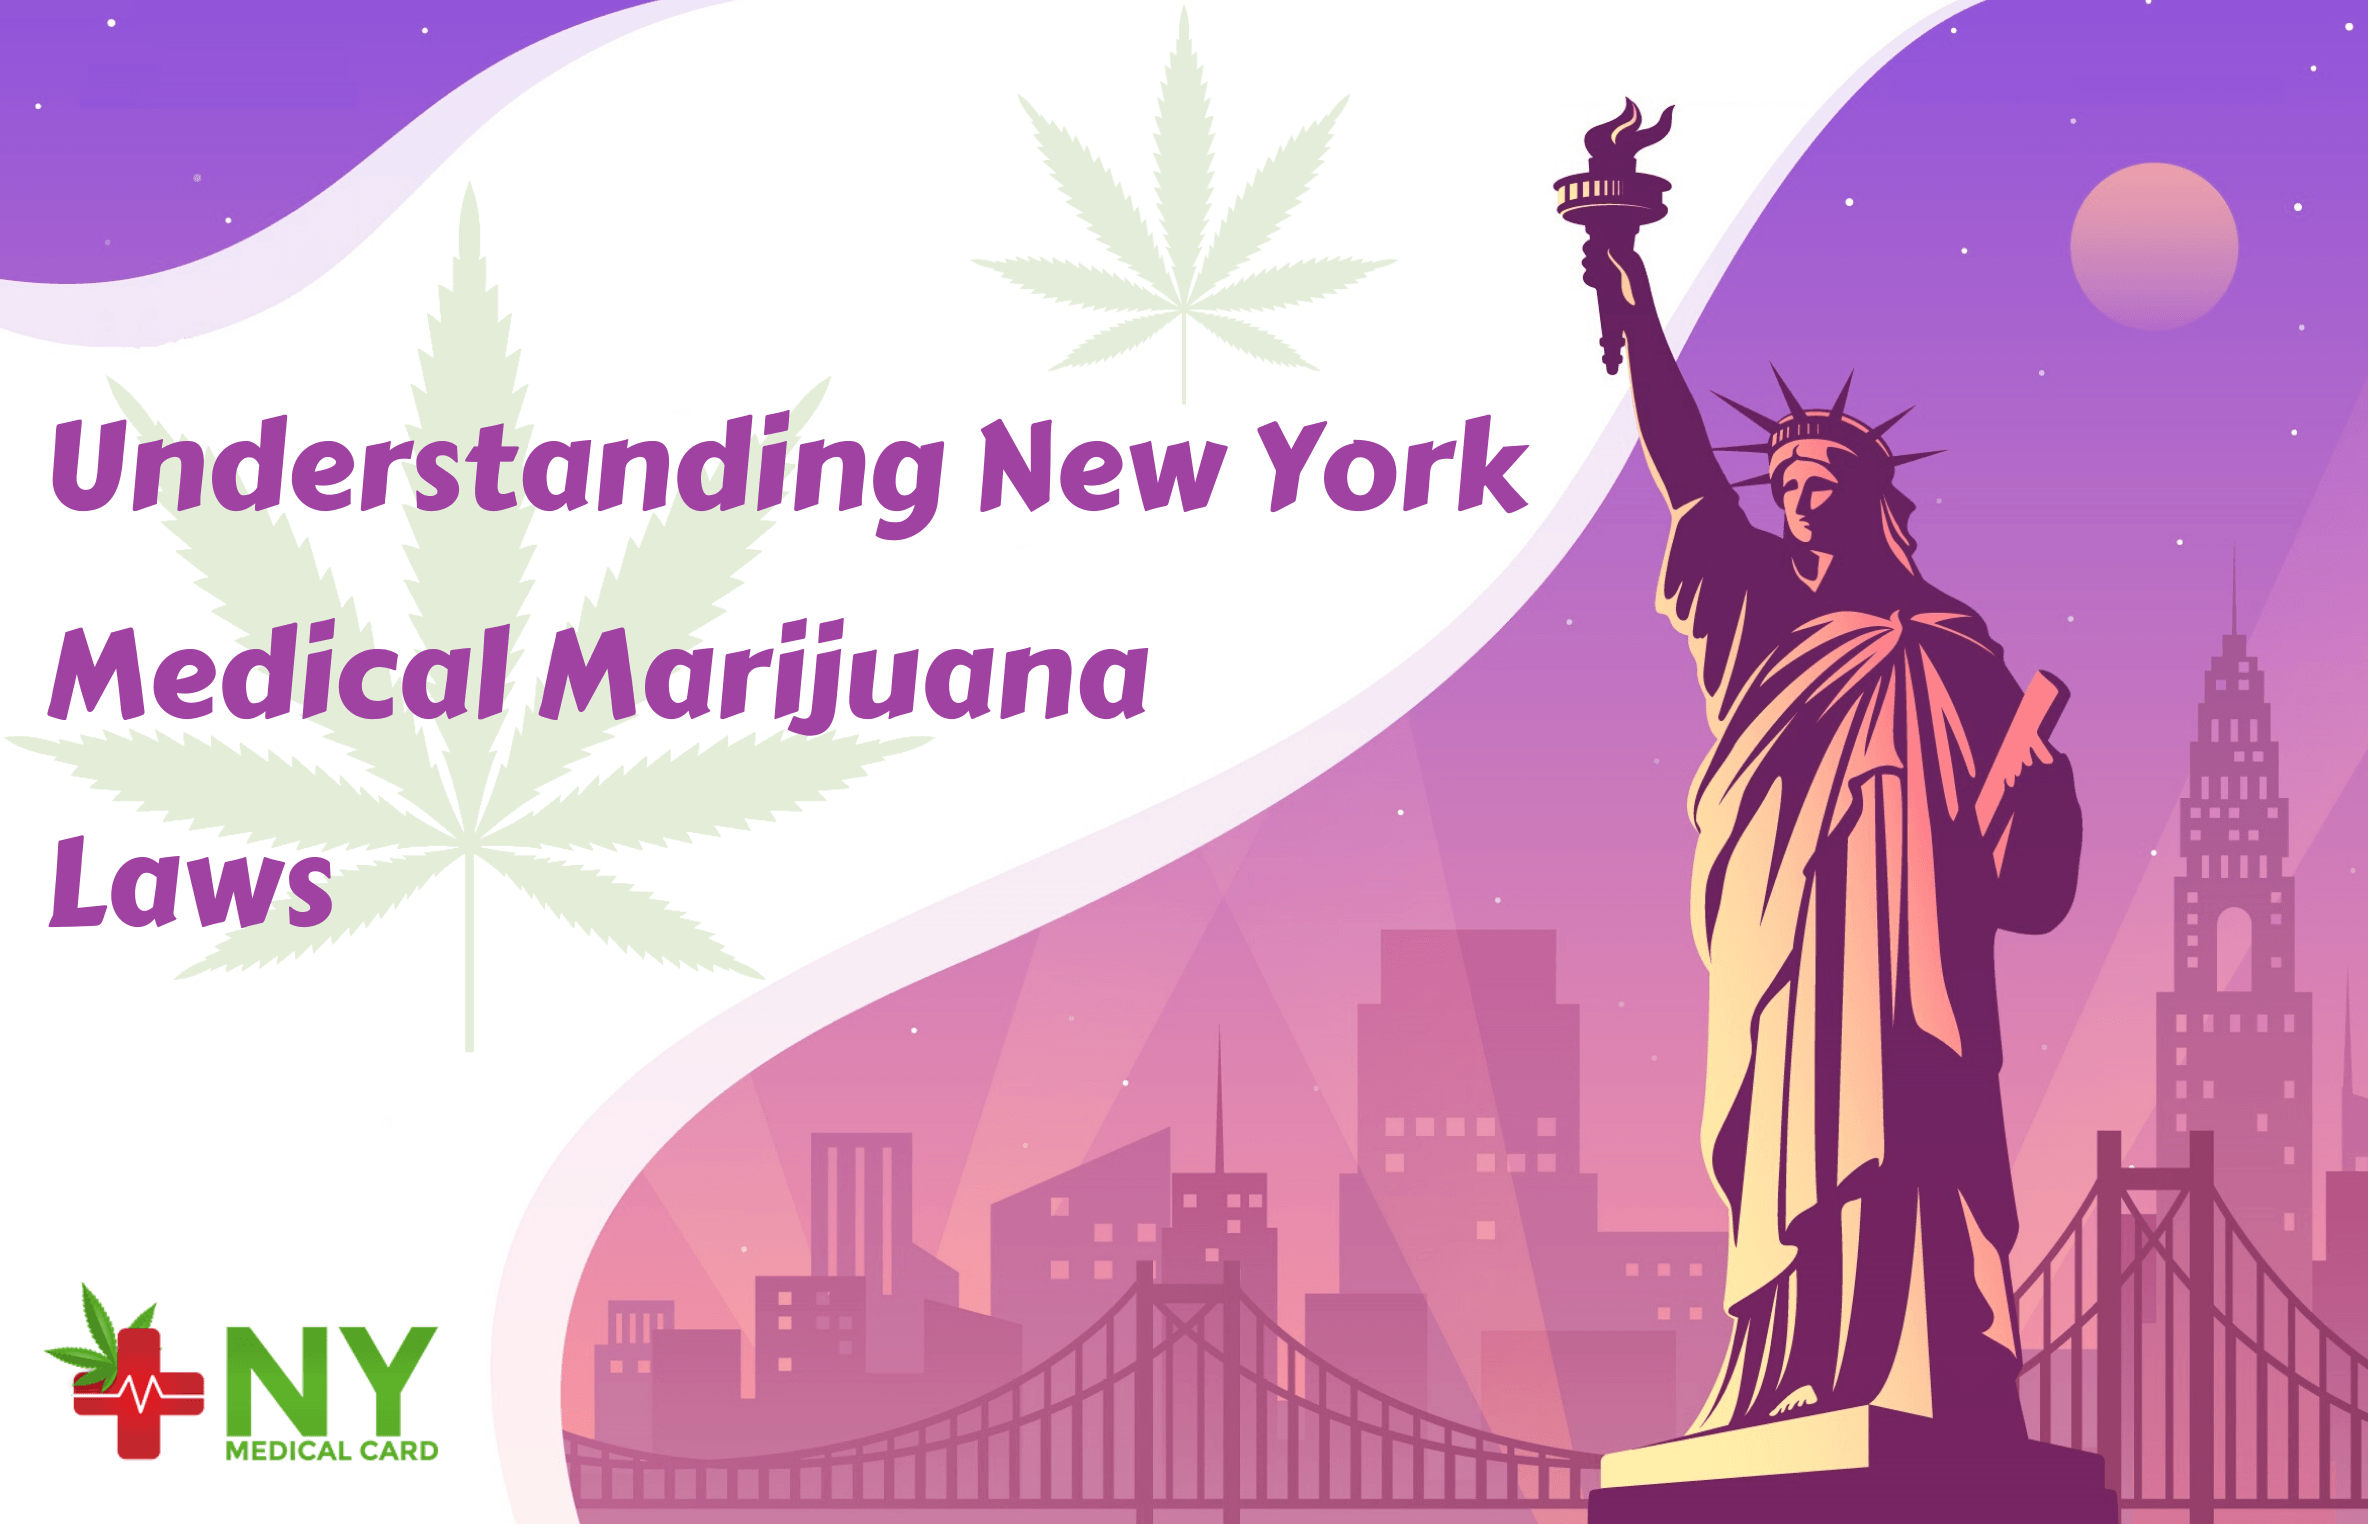 New York Medical Marijuana Laws